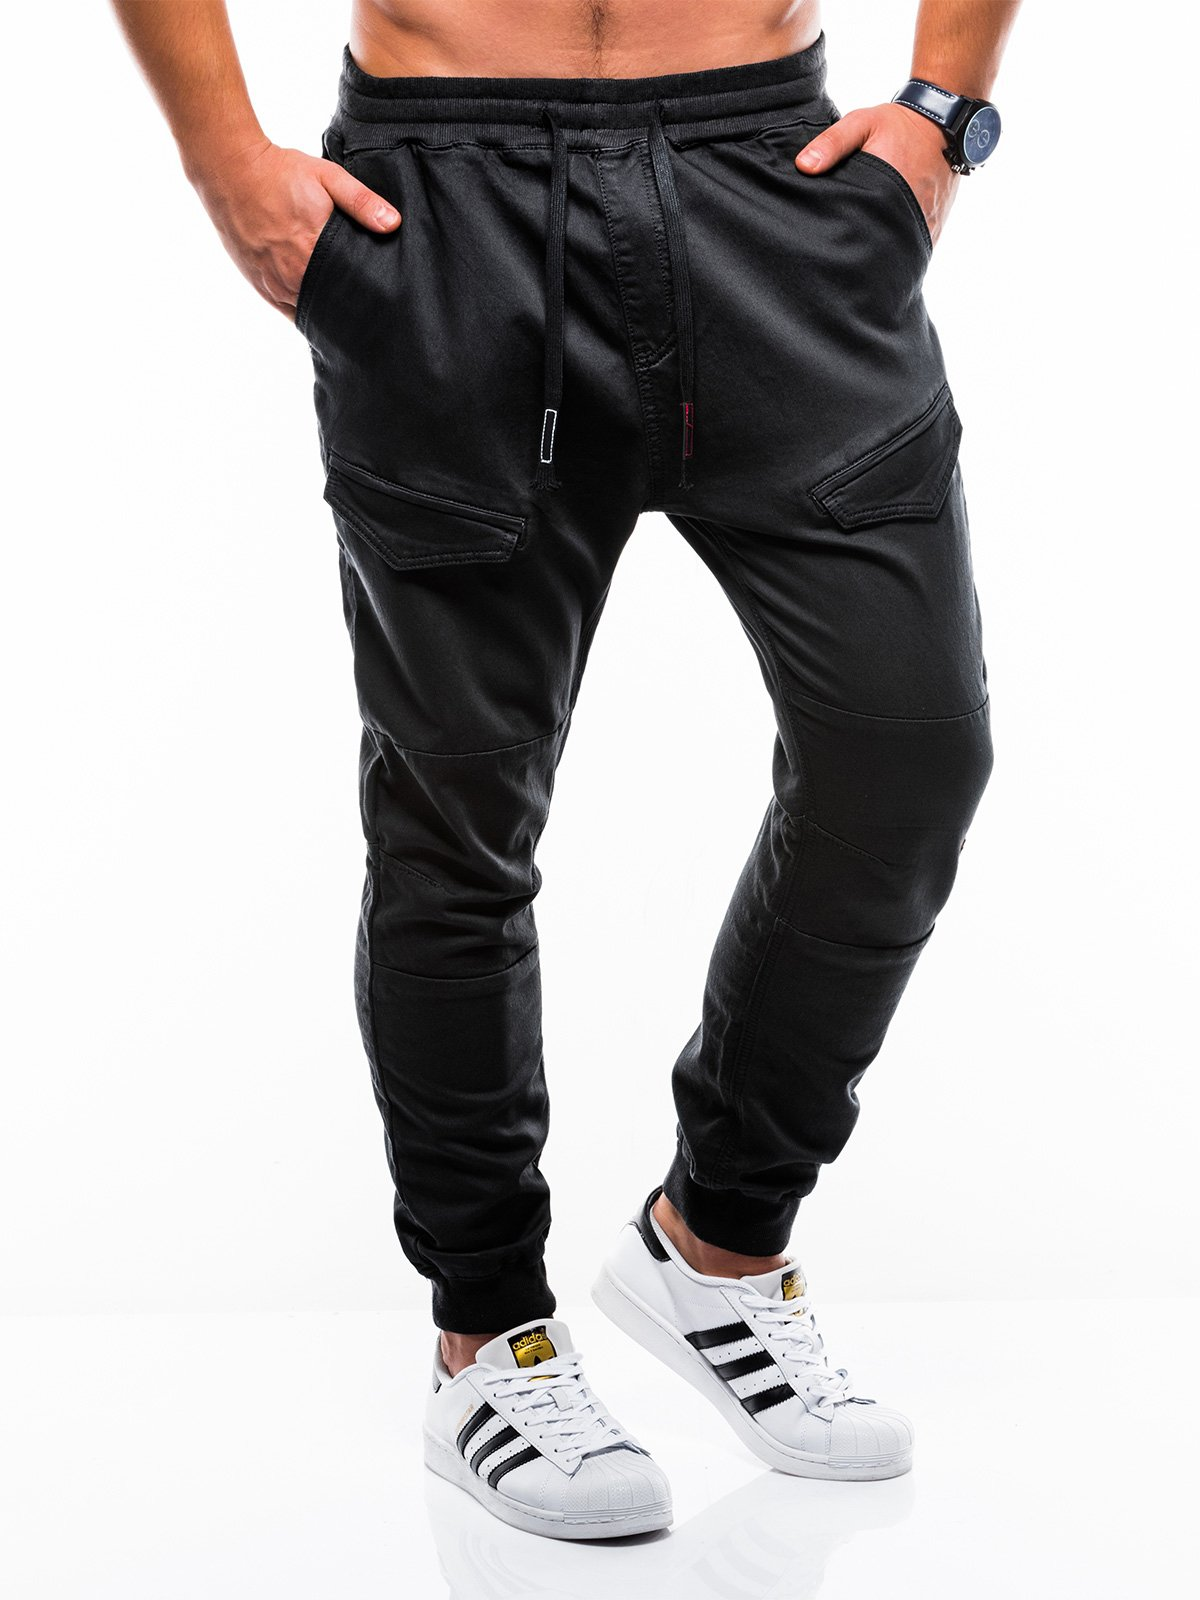 Spodnie męskie joggery 813P czarne